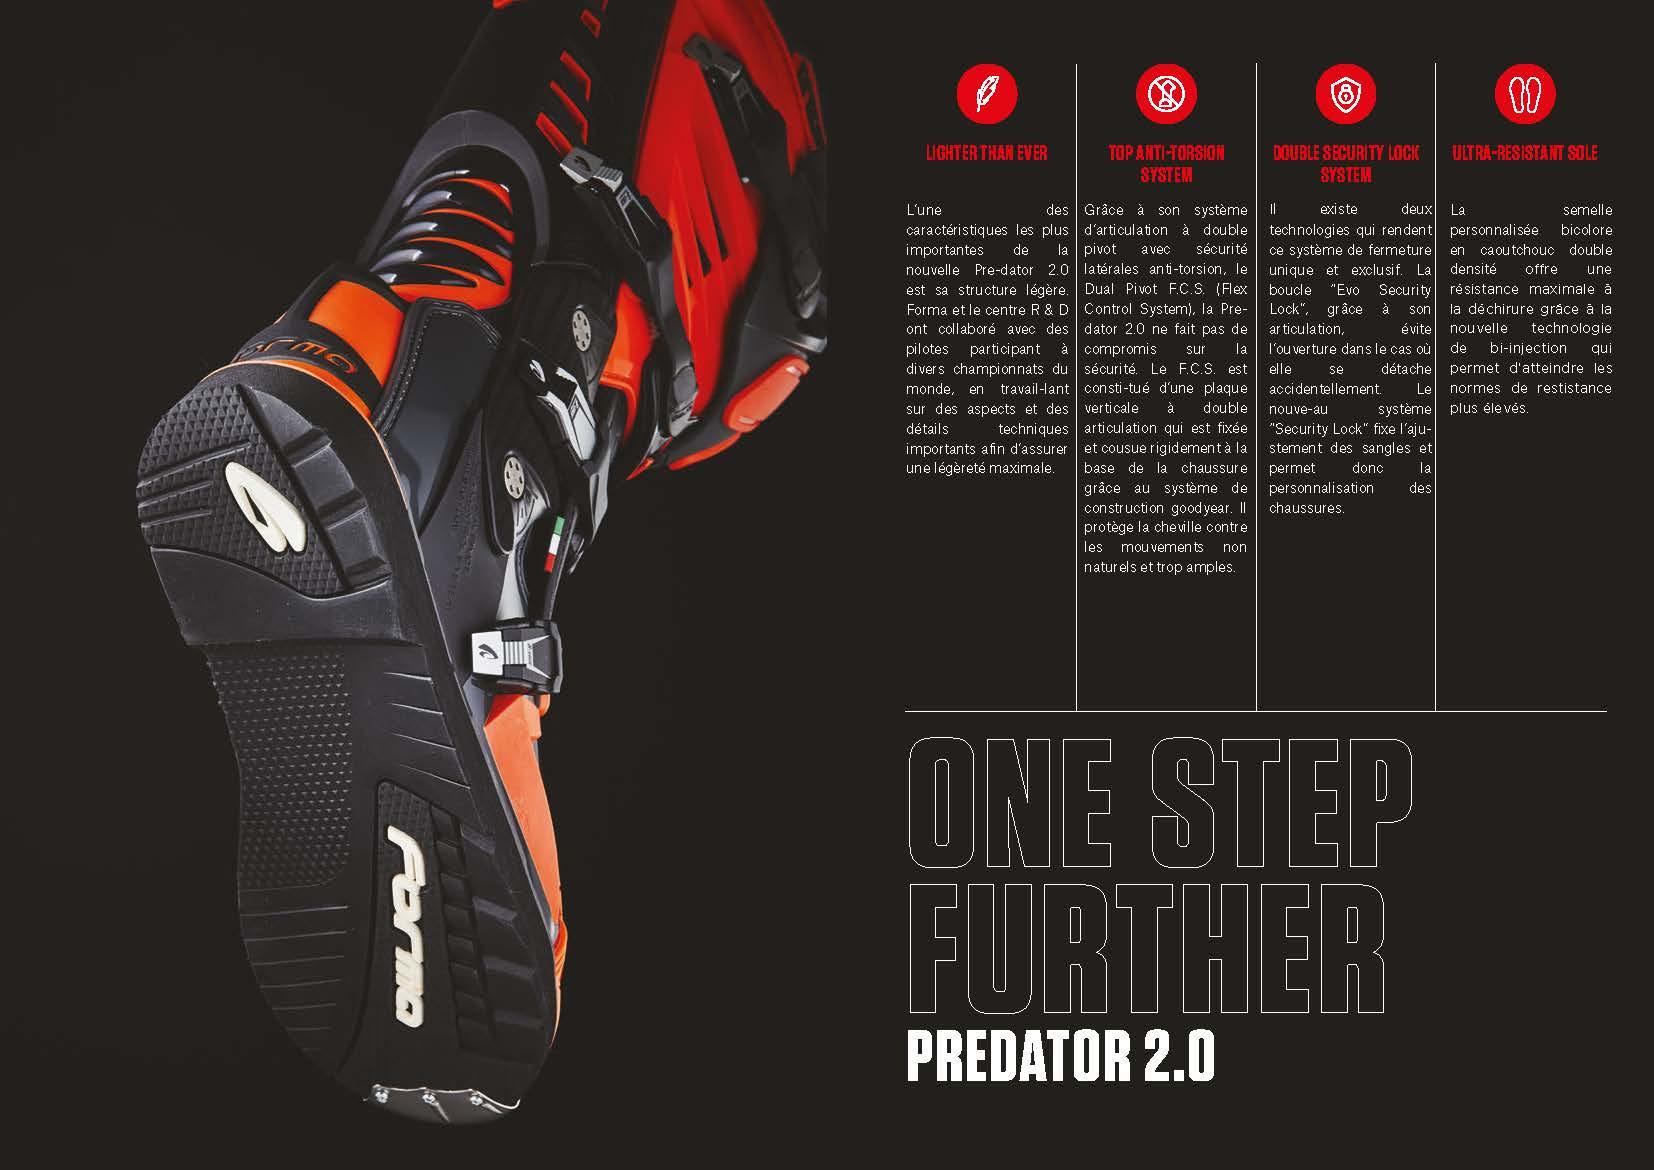 predator 2.0 2